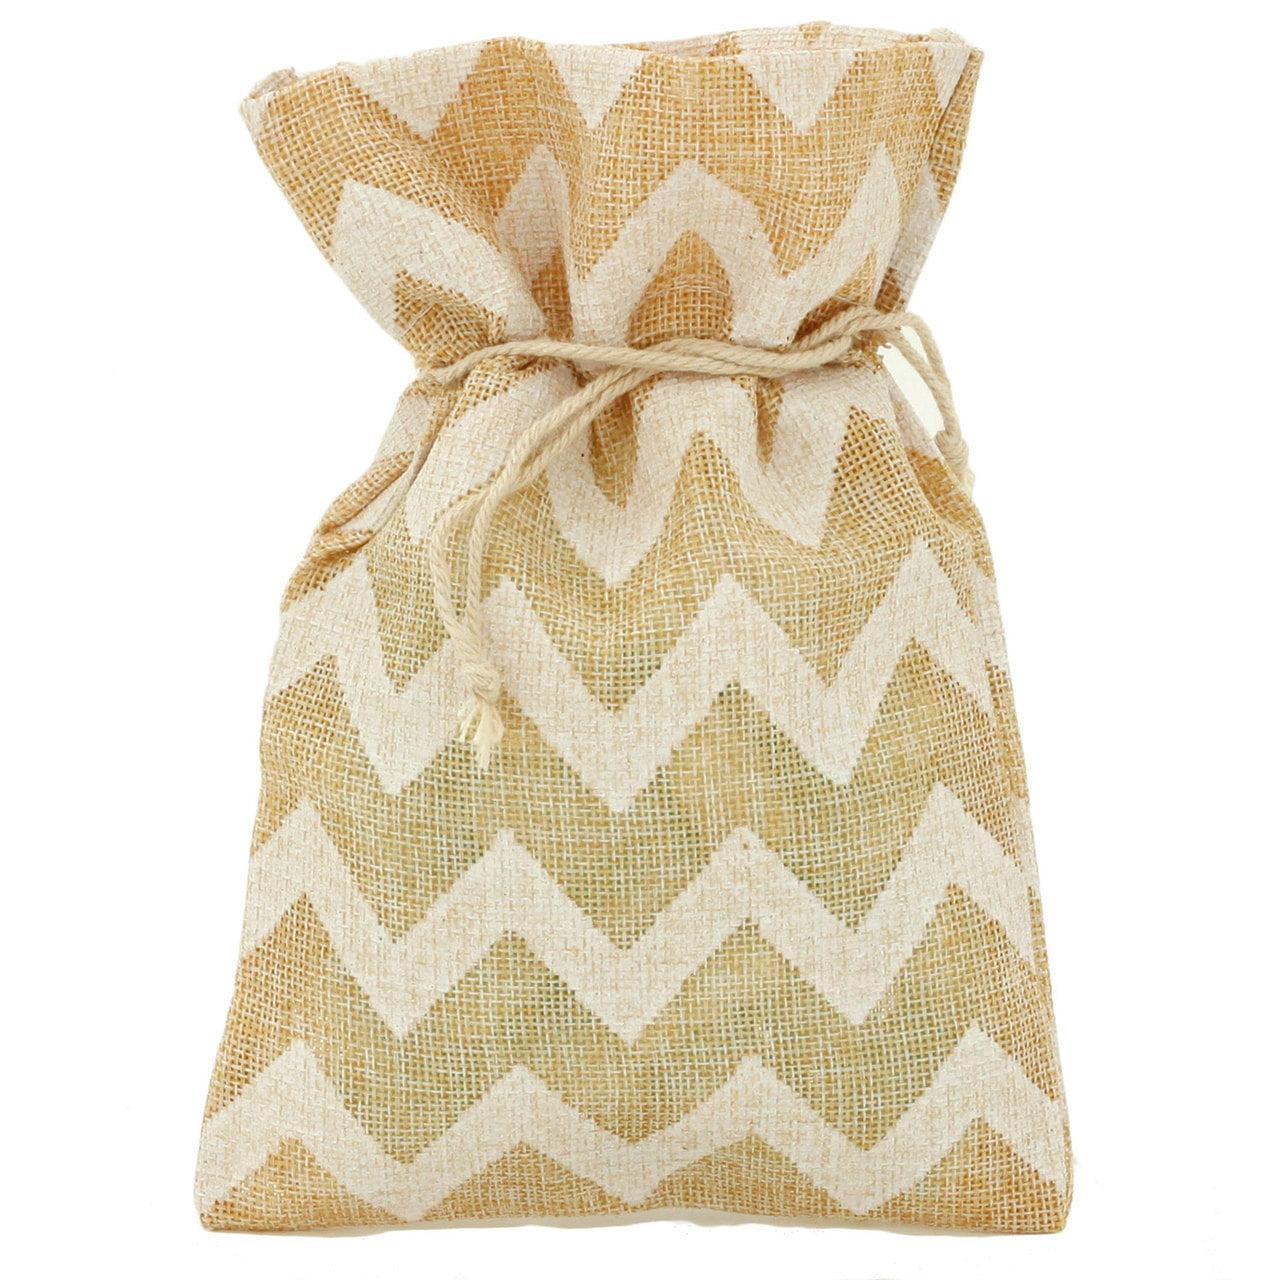 20 Burlap Chevron Style Cute Gift Party Favor Fabric Birthday Treat Goody Bag - Beige/White